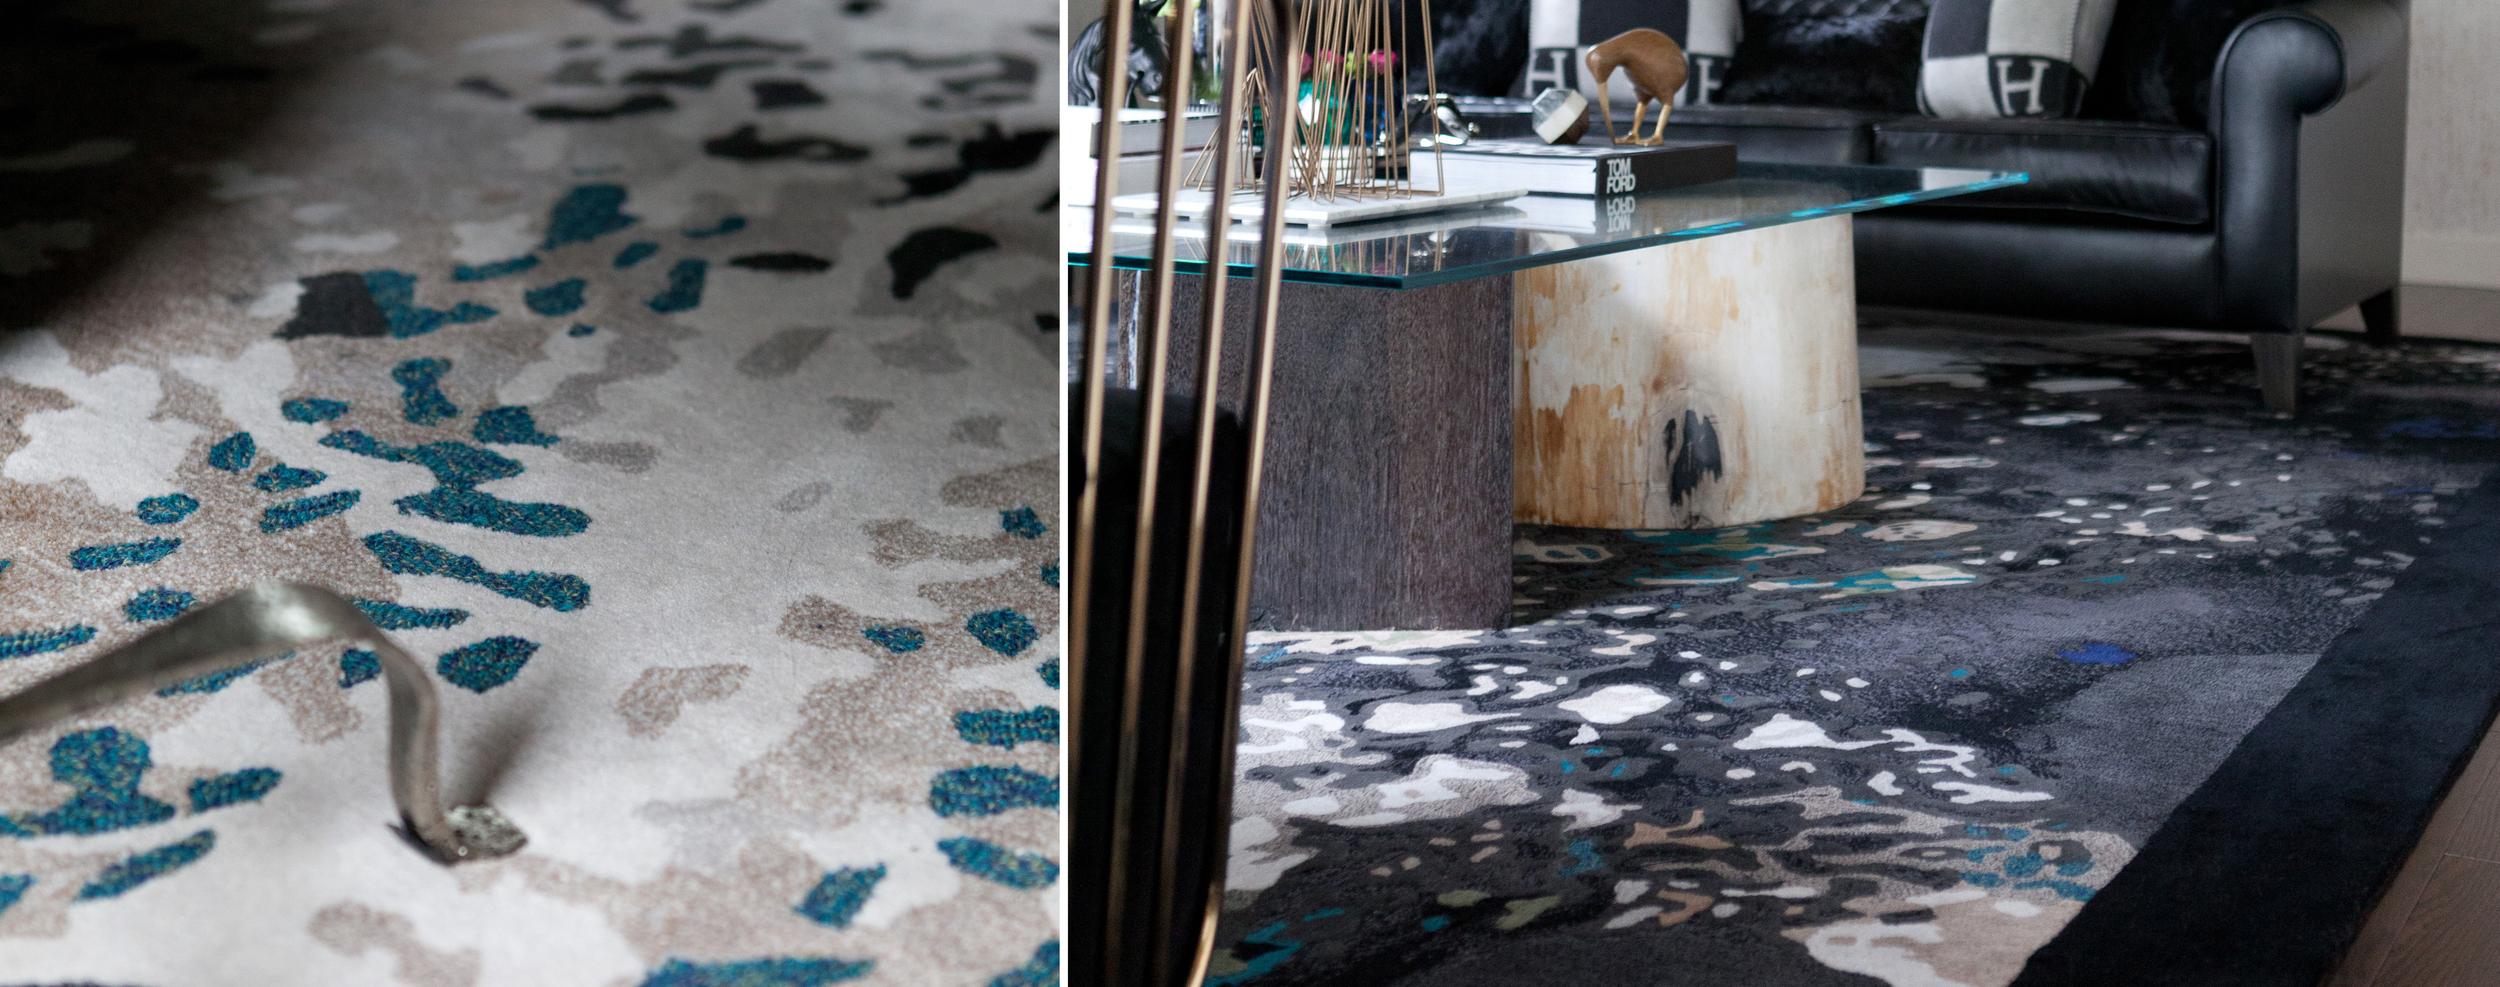 ANIMAL INSTINCT - BLACK AT THE LA JOLLA AVE PROJECT